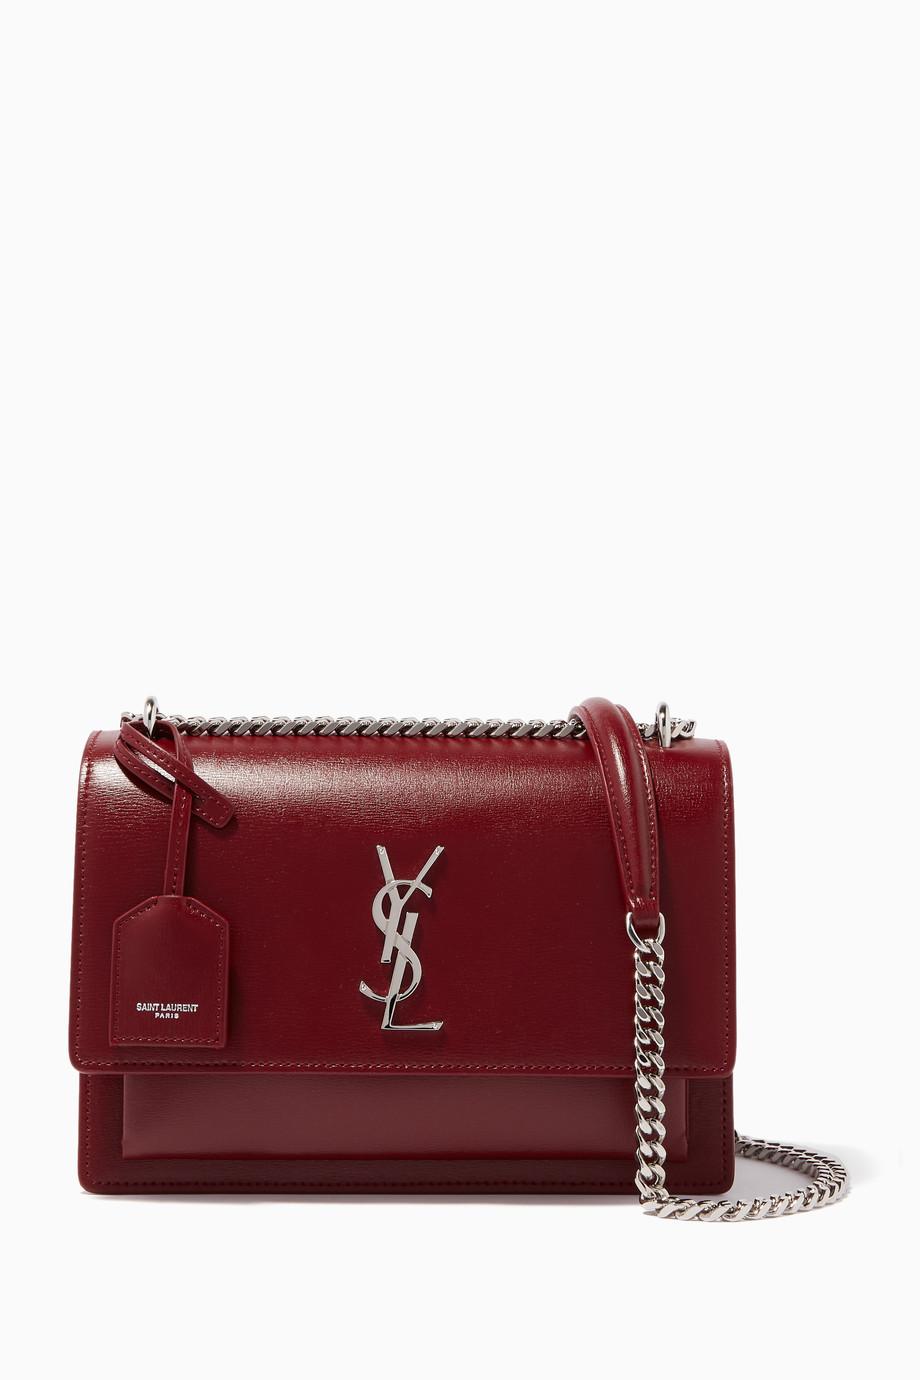 Shop Saint Laurent Red Dark-Red Medium Sunset Leather Cross-Body Bag ... 3d6b67cfbe1a9